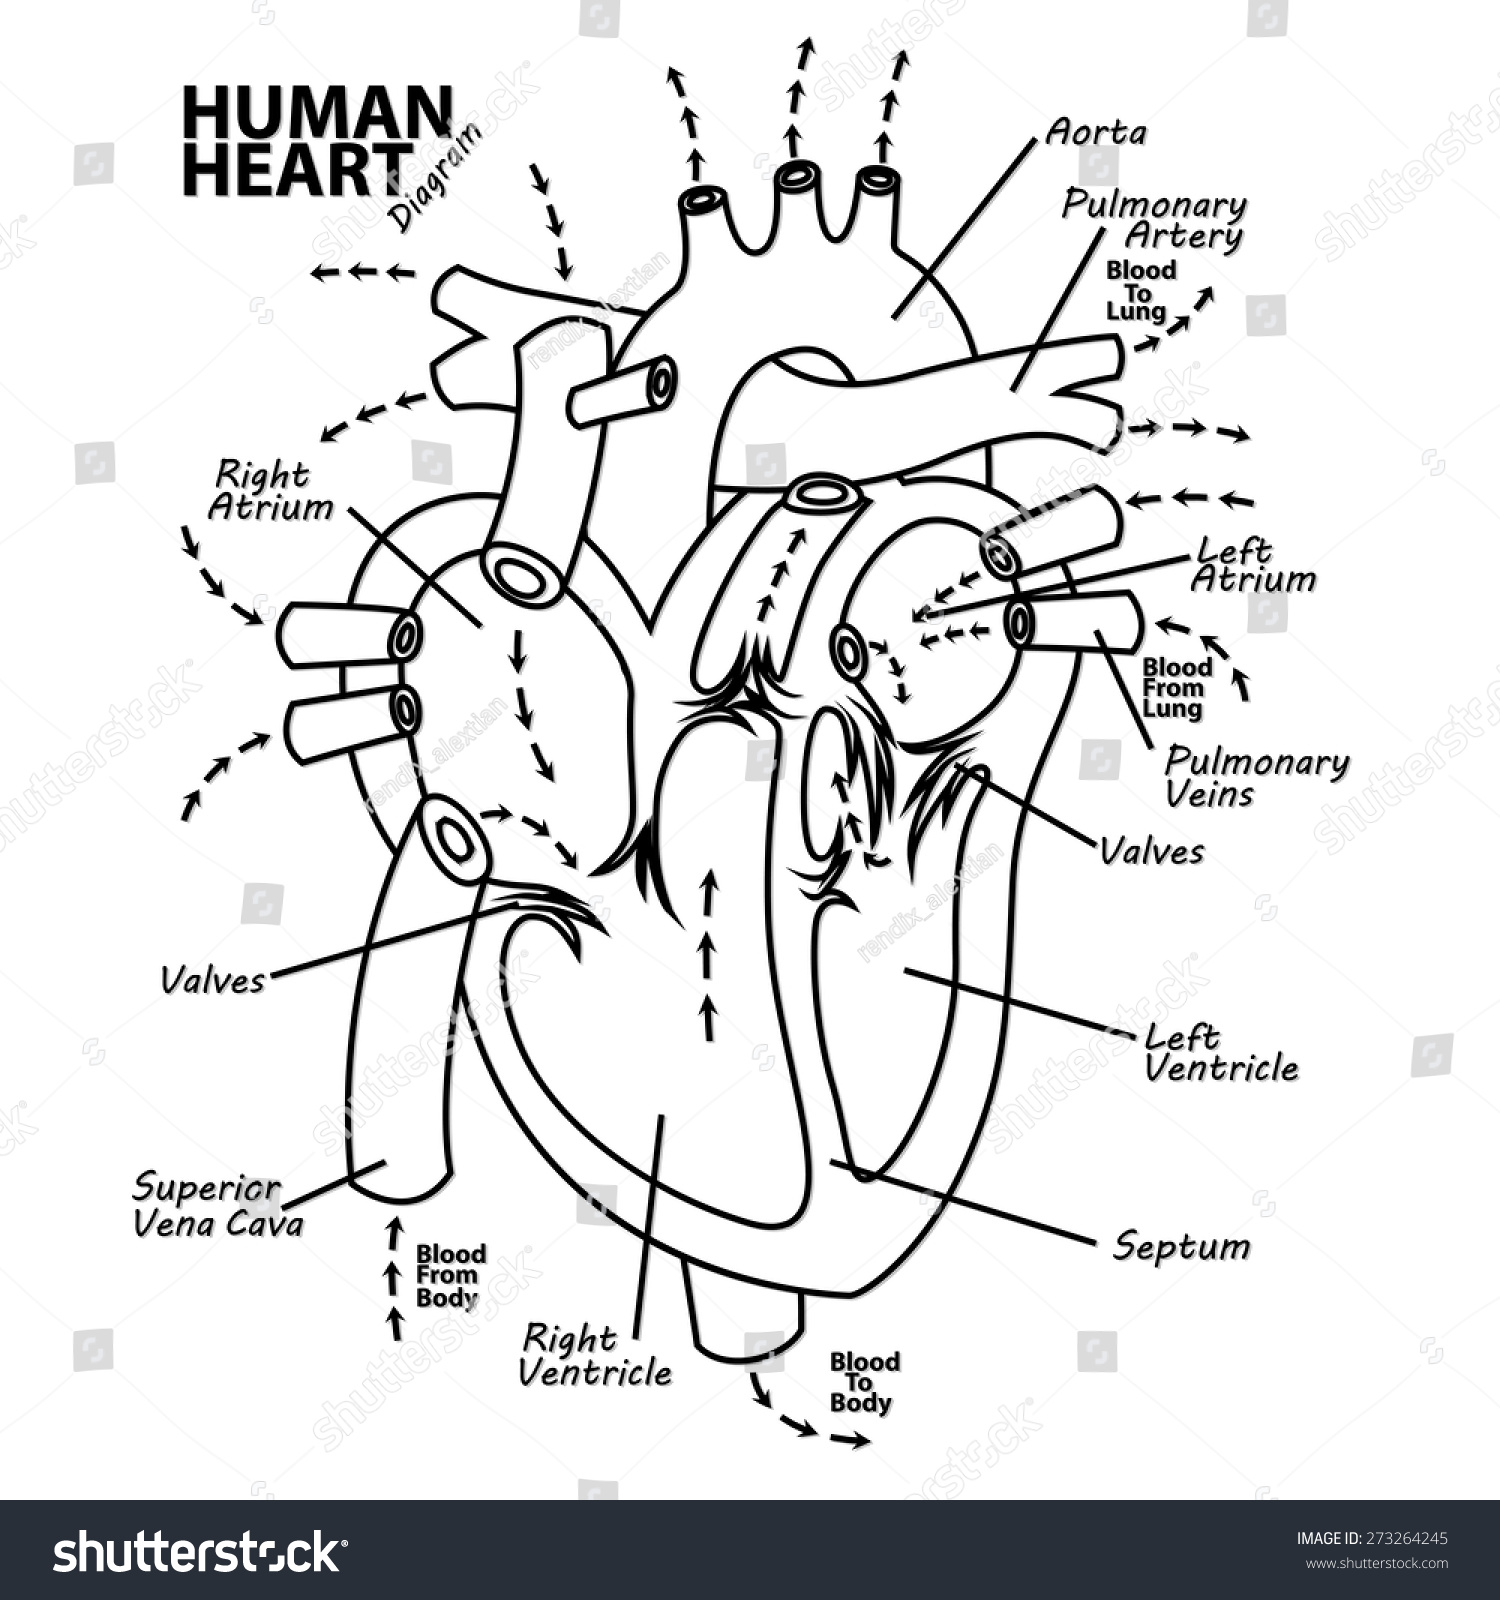 anatomical heart diagram 2007 chrysler sebring radio wiring human anatomy stock vector 273264245